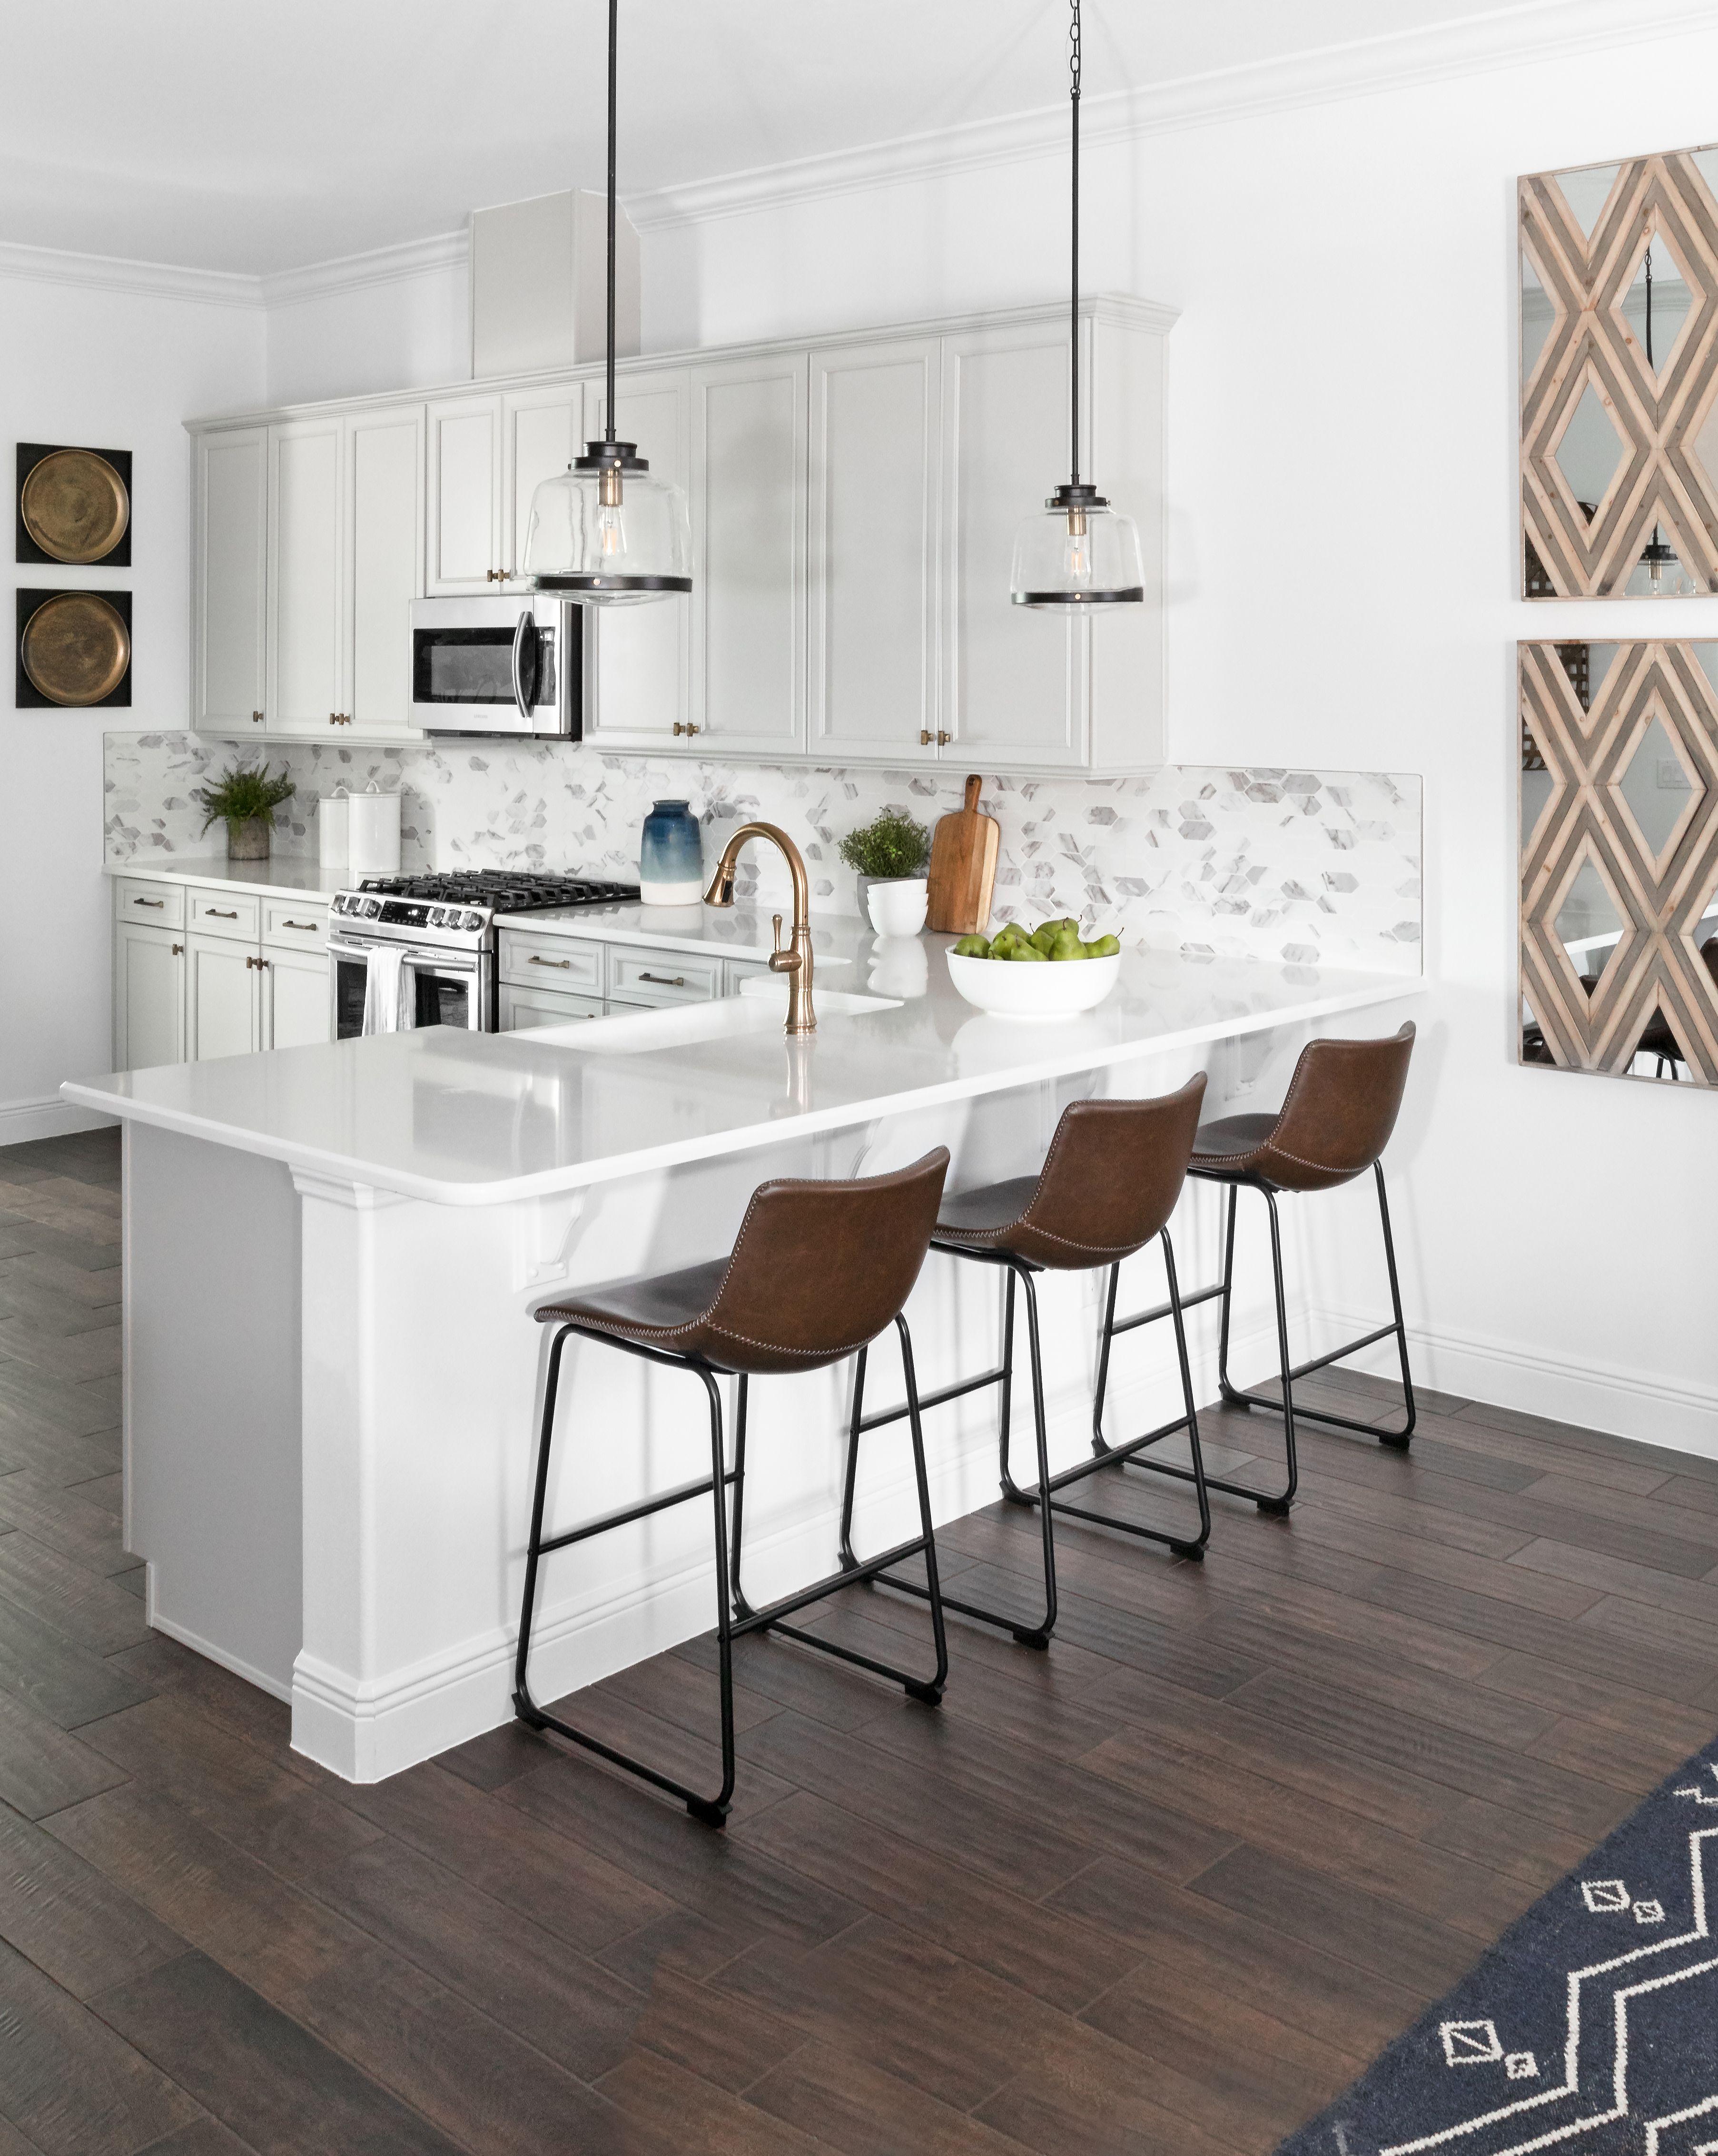 Kitchen featured in the Almeria II By Viera Builders  in Melbourne, FL